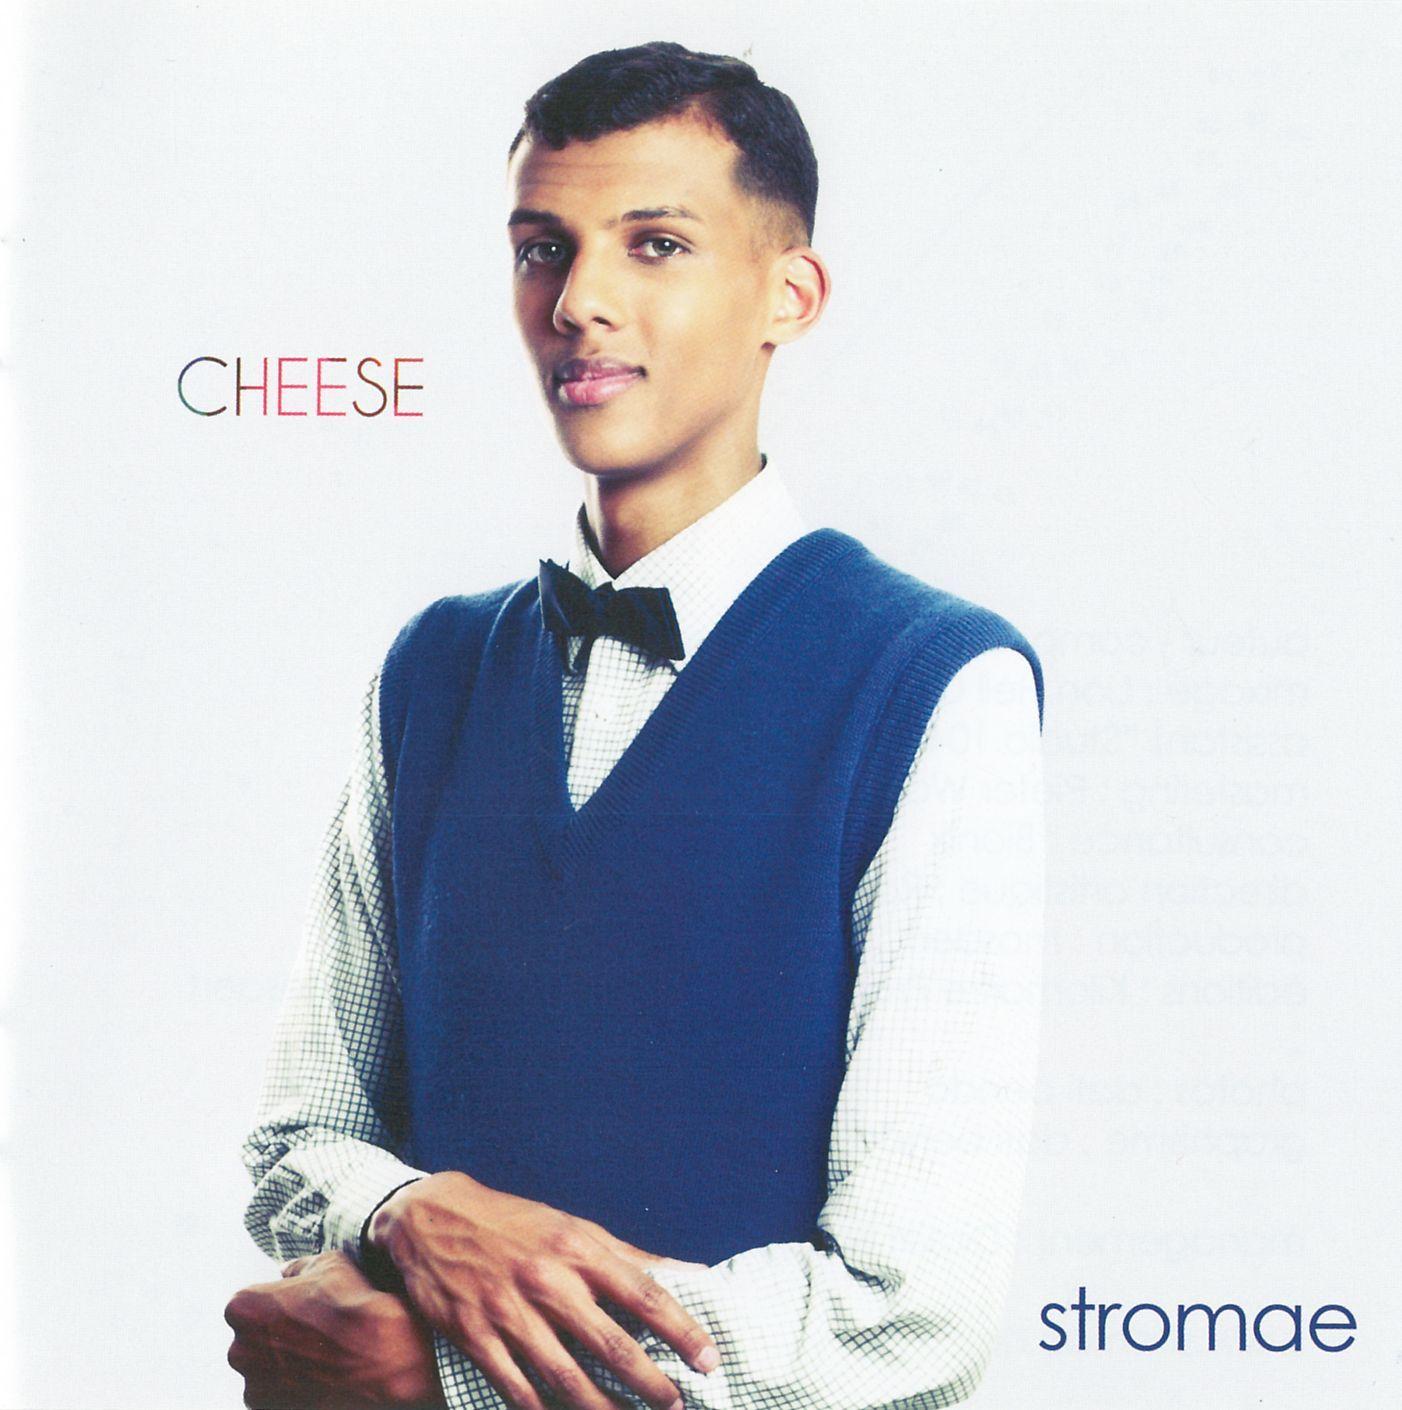 Stromae - Cheese album cover